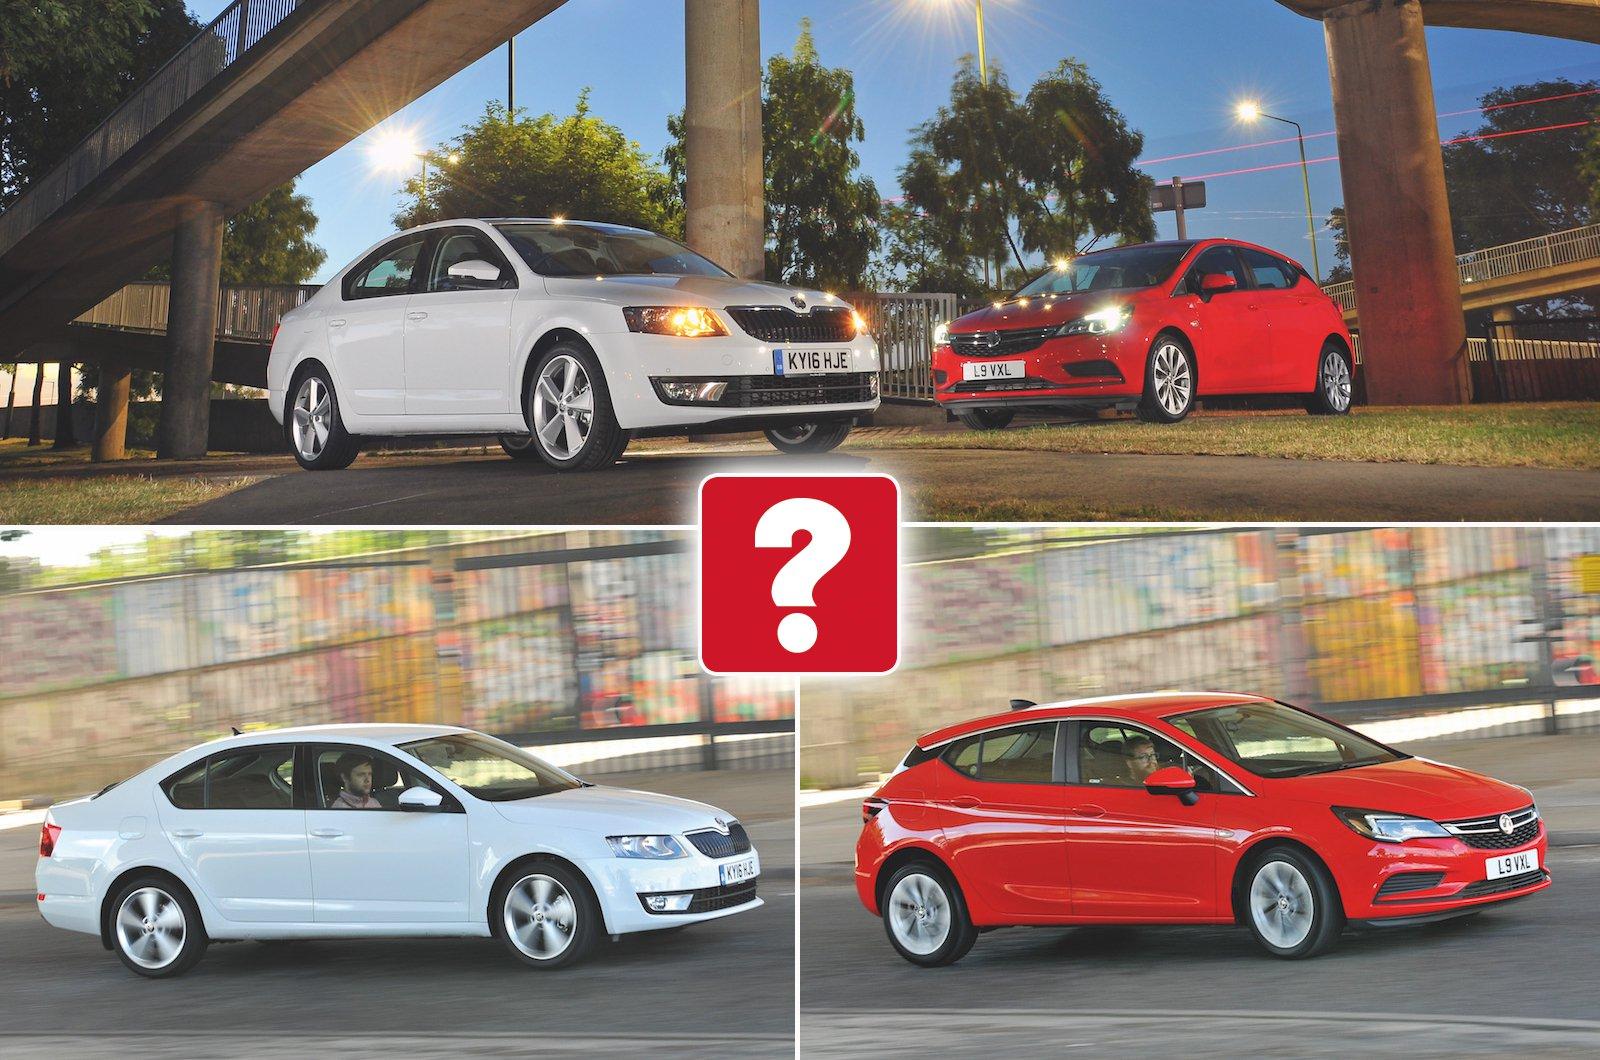 Used Skoda Octavia vs Vauxhall Astra